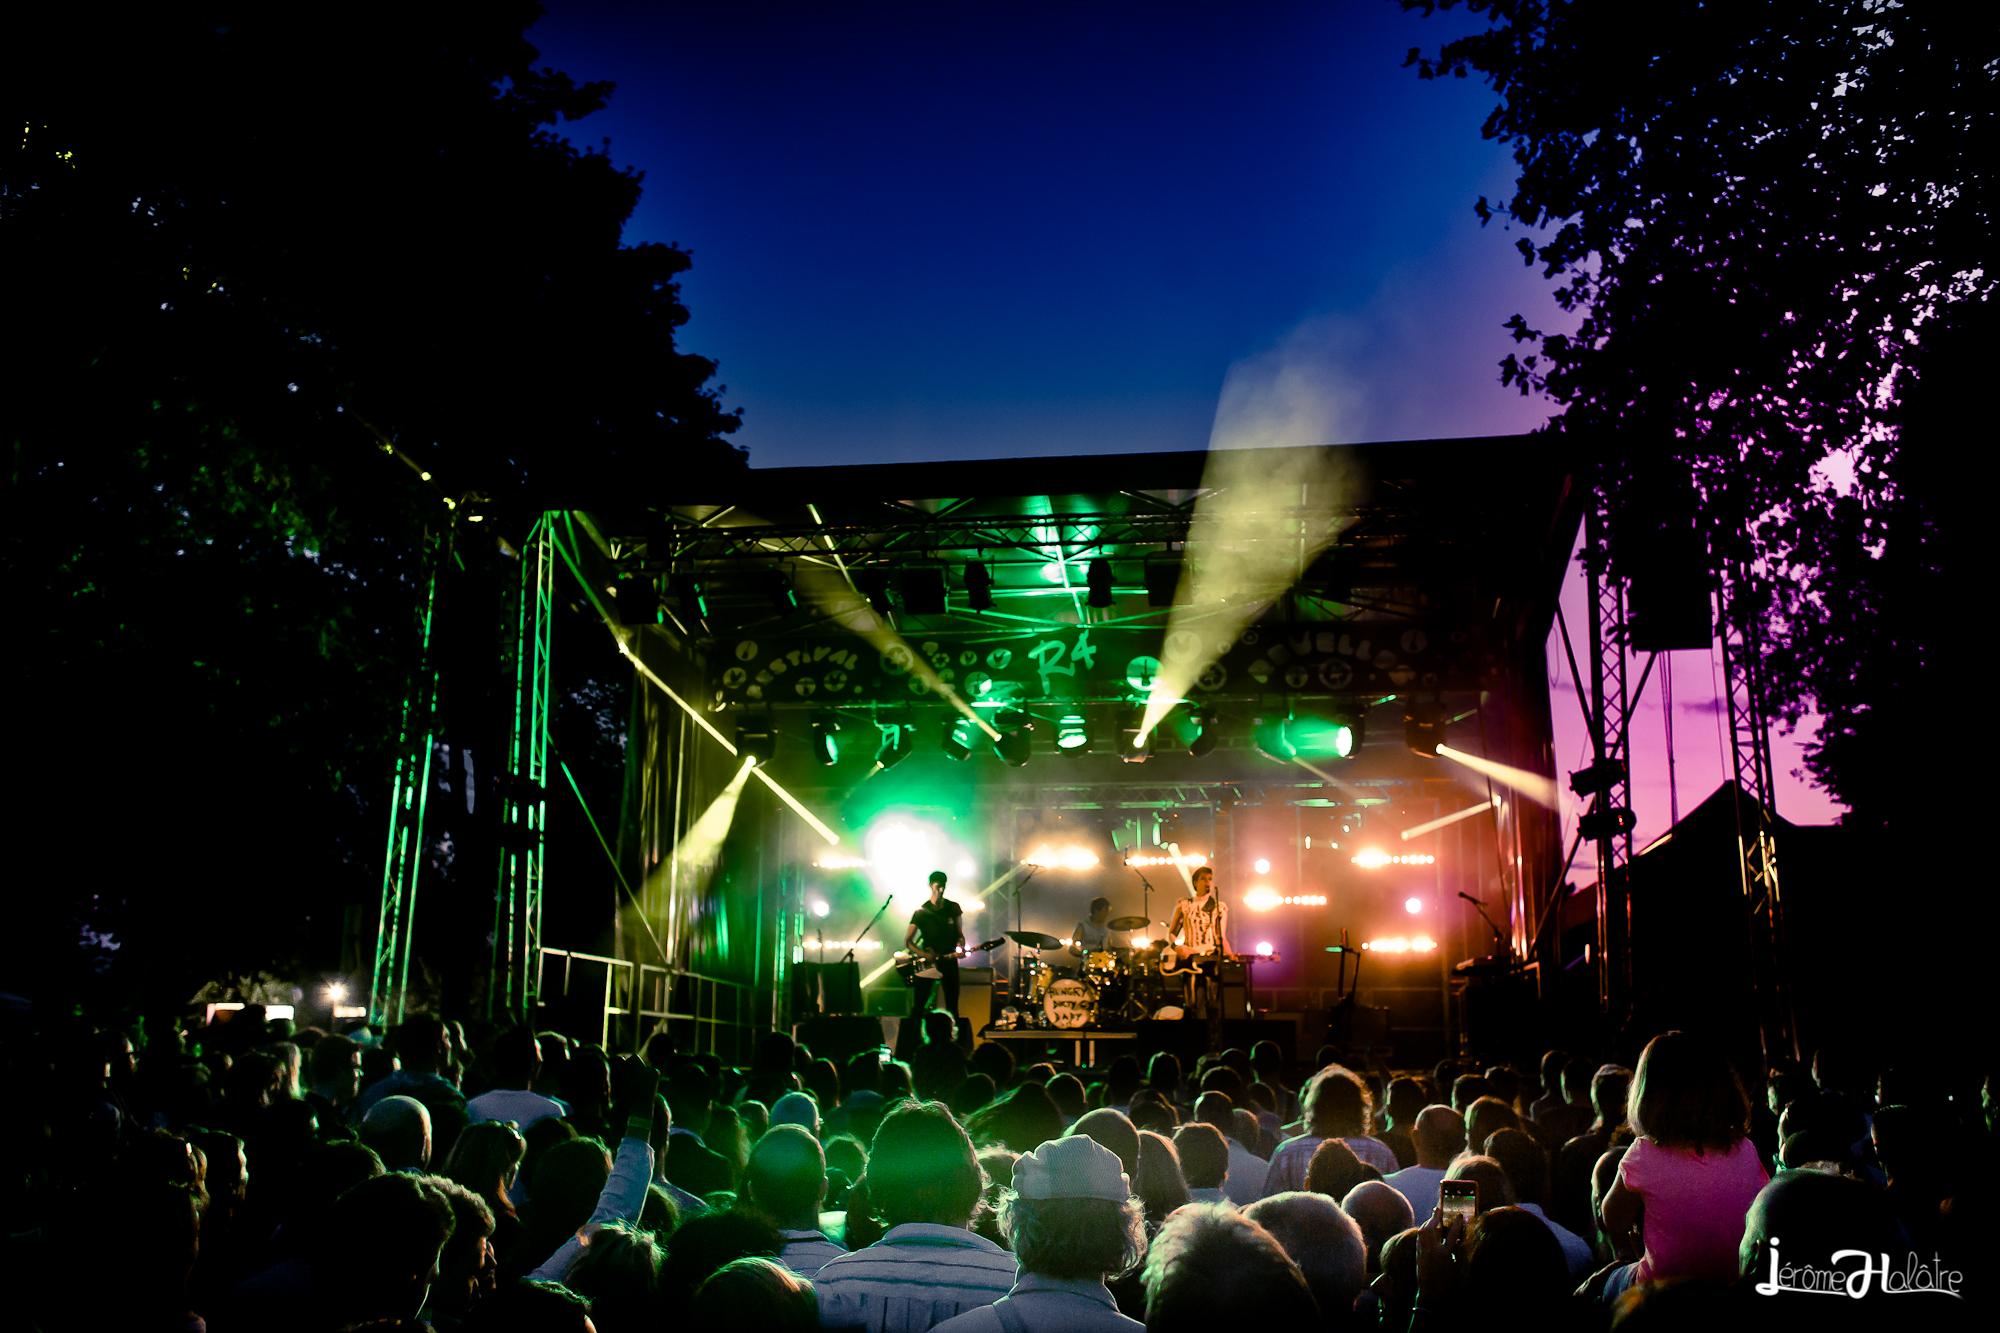 Festival Rock R4 - 3&4 Juillet 2015 - Revelles - France (5)